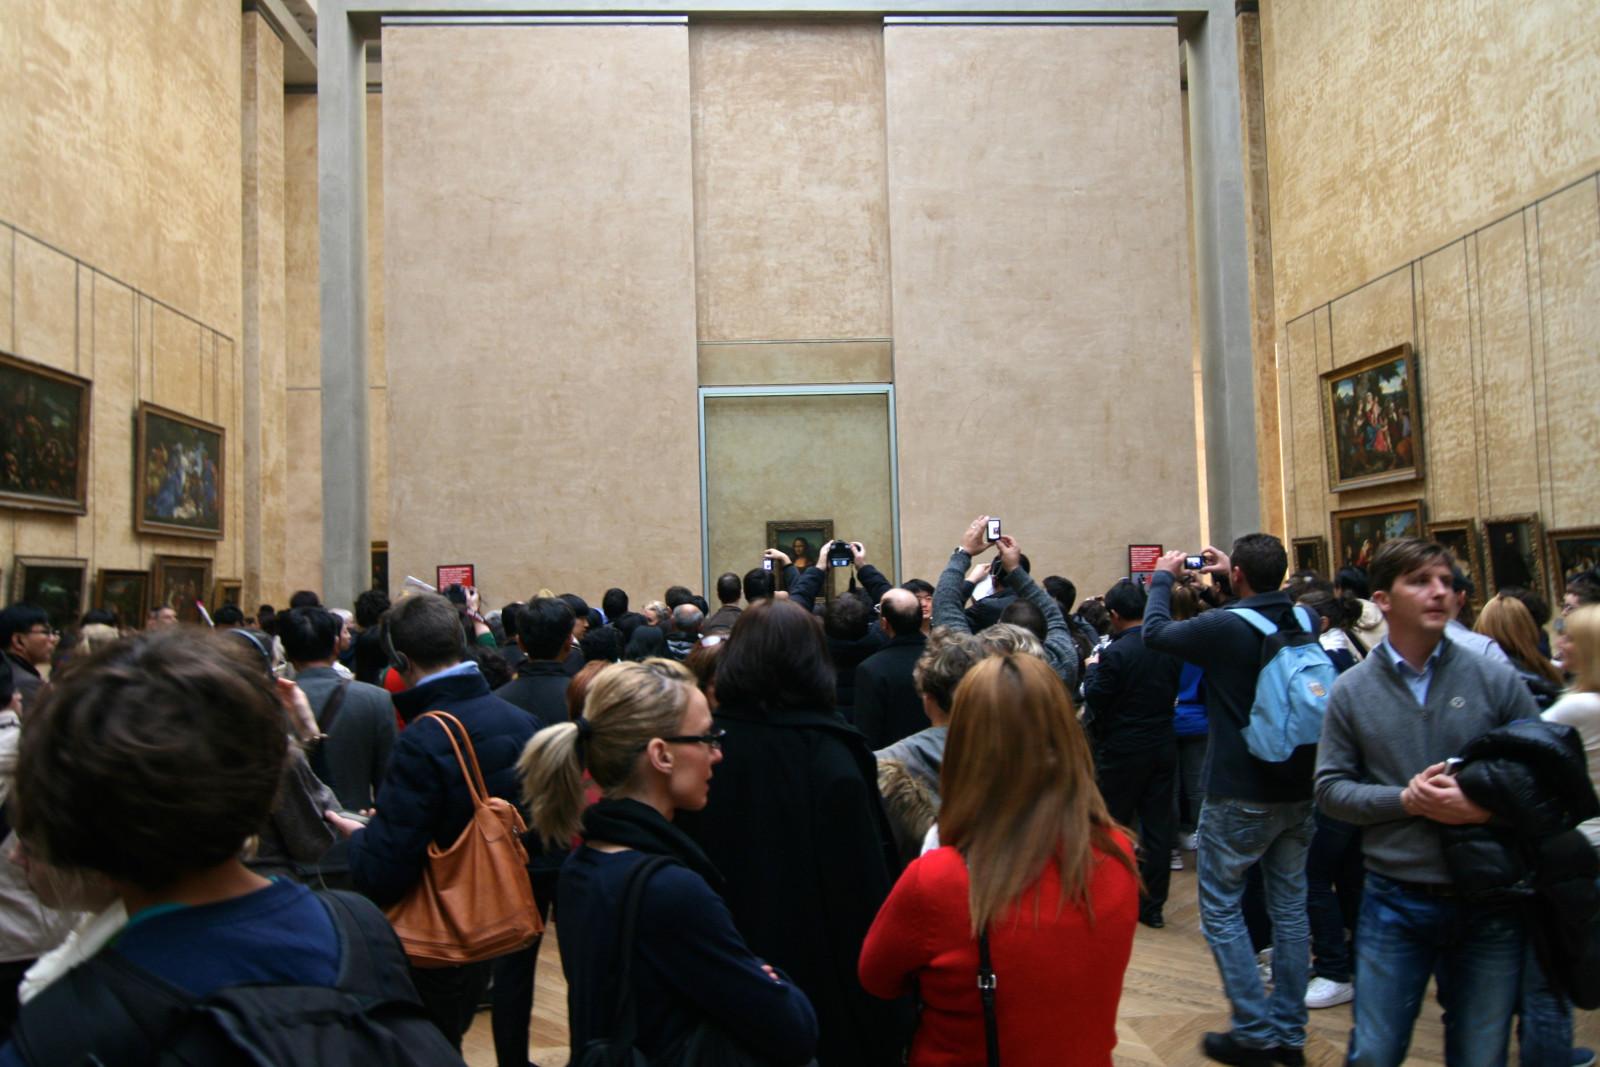 Mona Lisa Louvre Paris tips